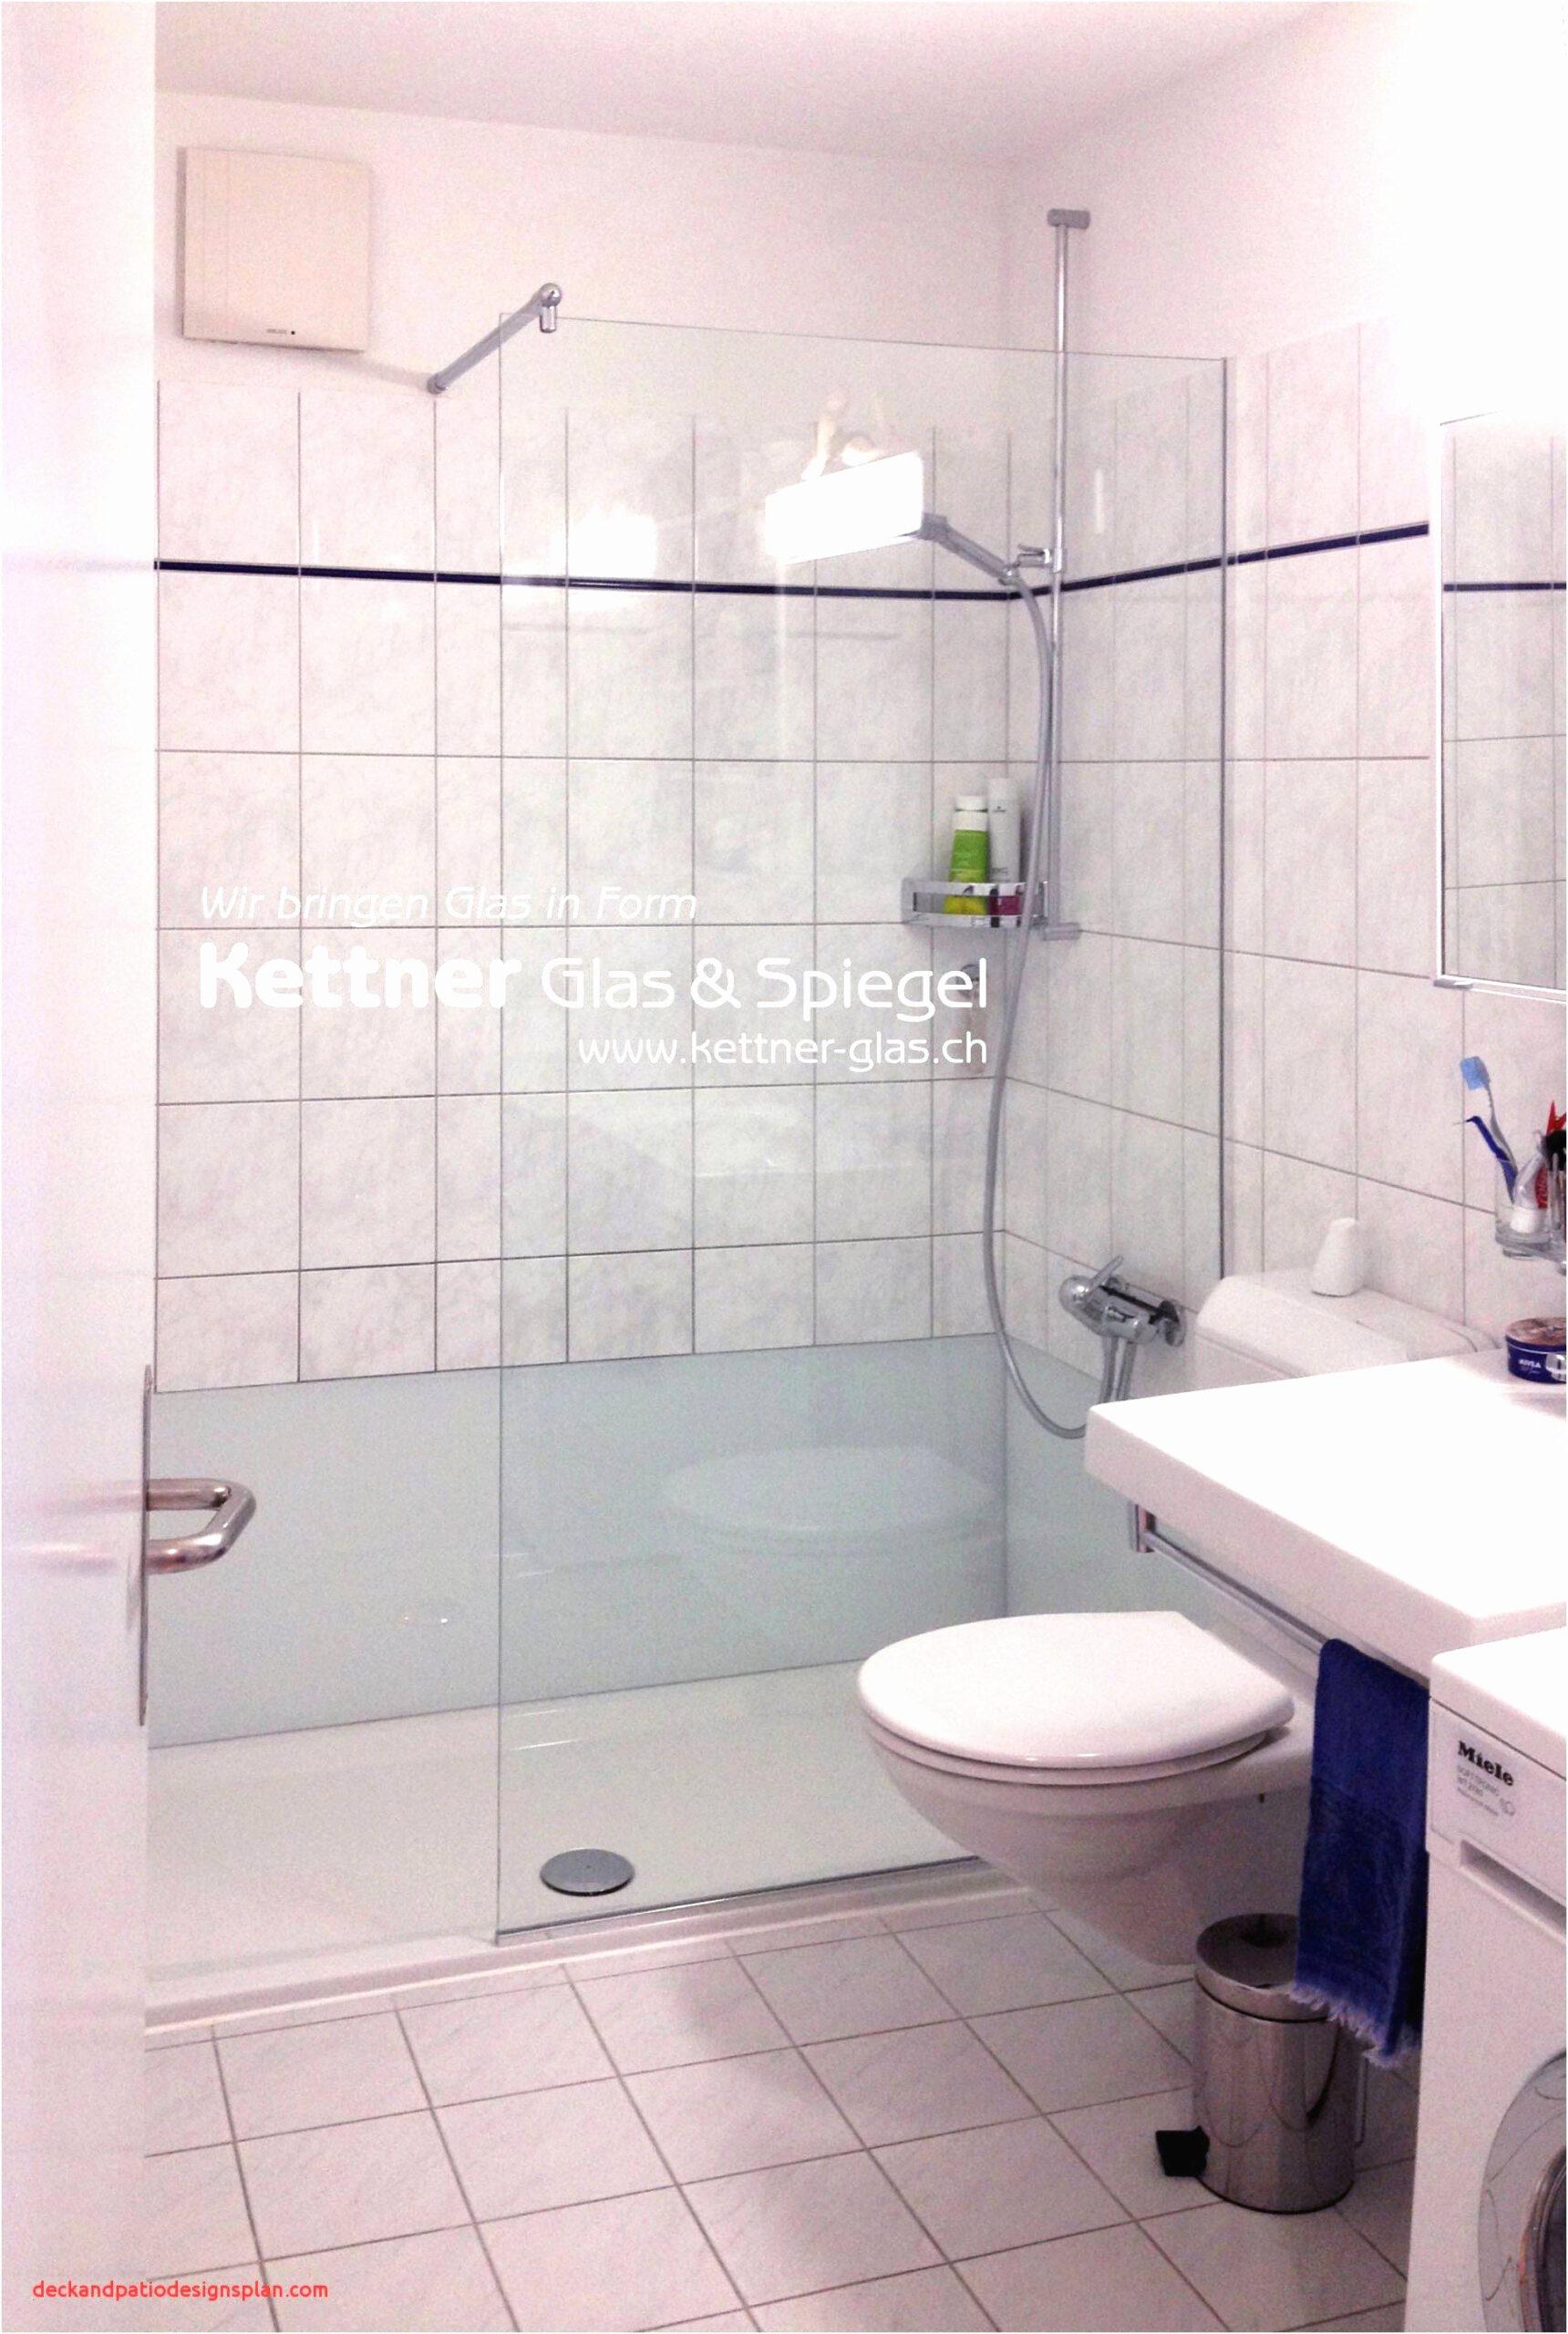 Full Size of Behindertengerechte Dusche Badezimmer Behindertengerecht Umbauen Grohe Thermostat Zuschuss Behindertengerechtes Bad Fliesen Glastrennwand Walkin Ebenerdig Dusche Behindertengerechte Dusche